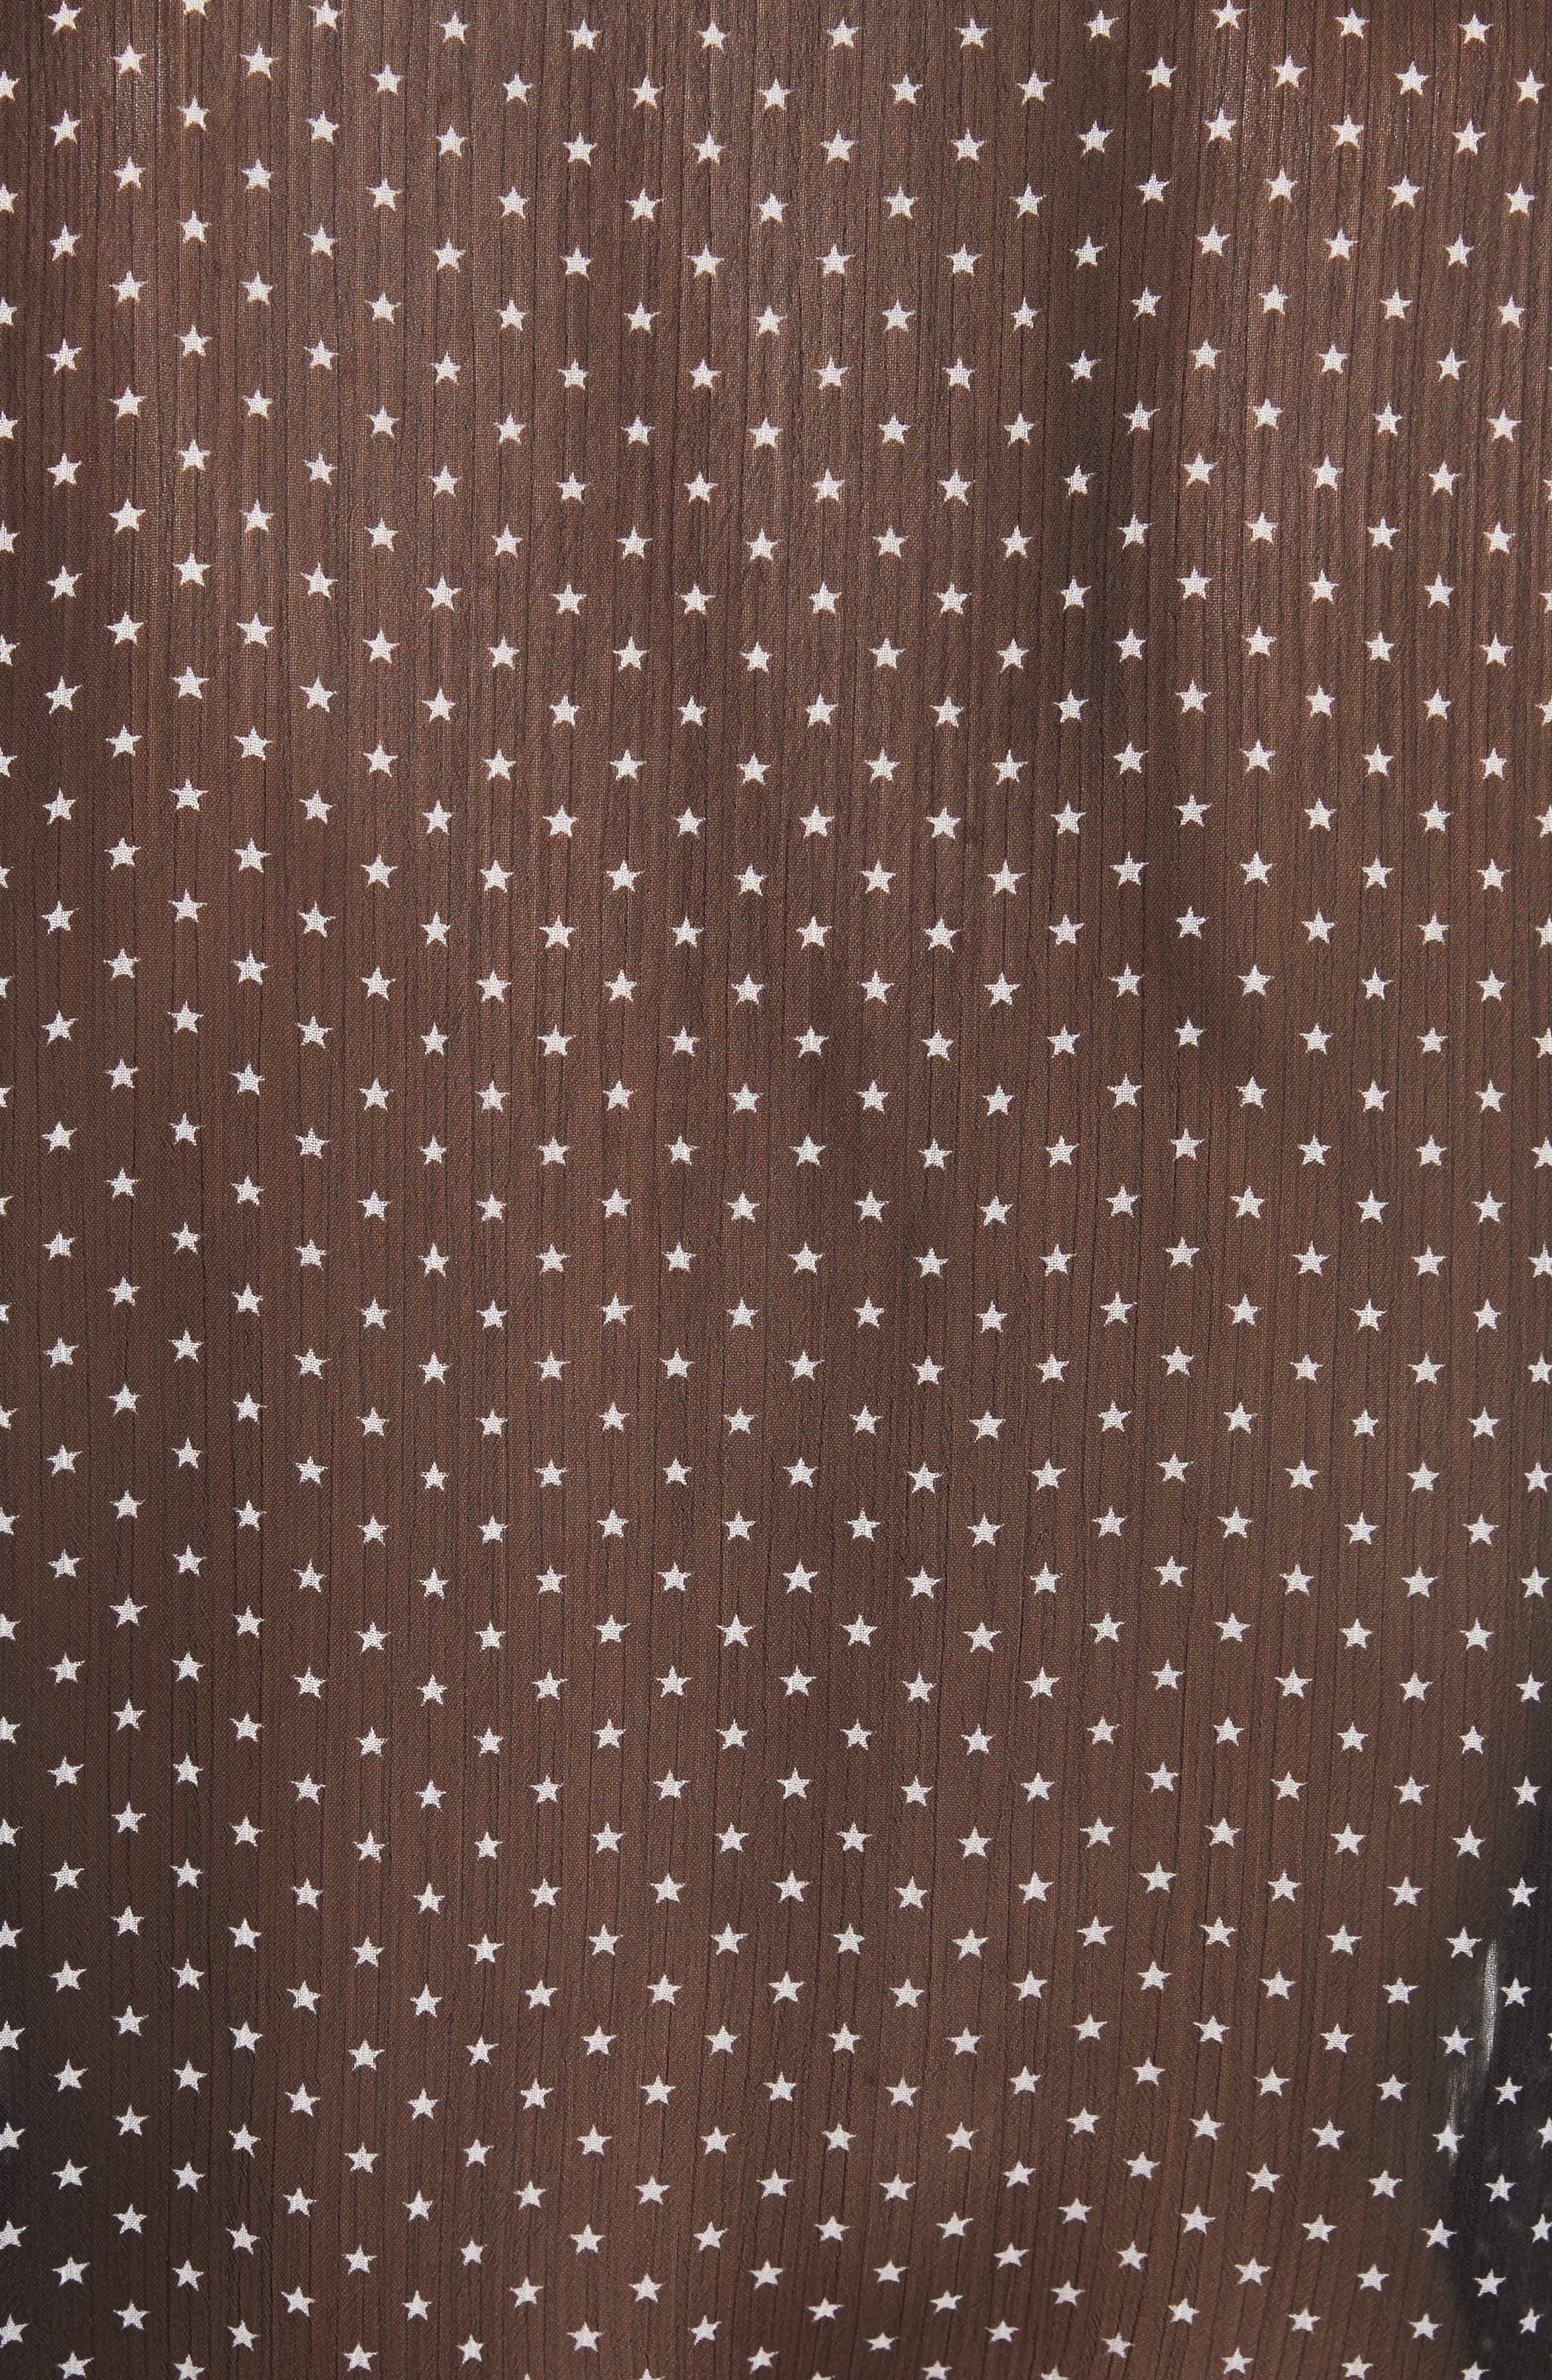 Tabitha Star Print Blouse,                             Alternate thumbnail 5, color,                             001